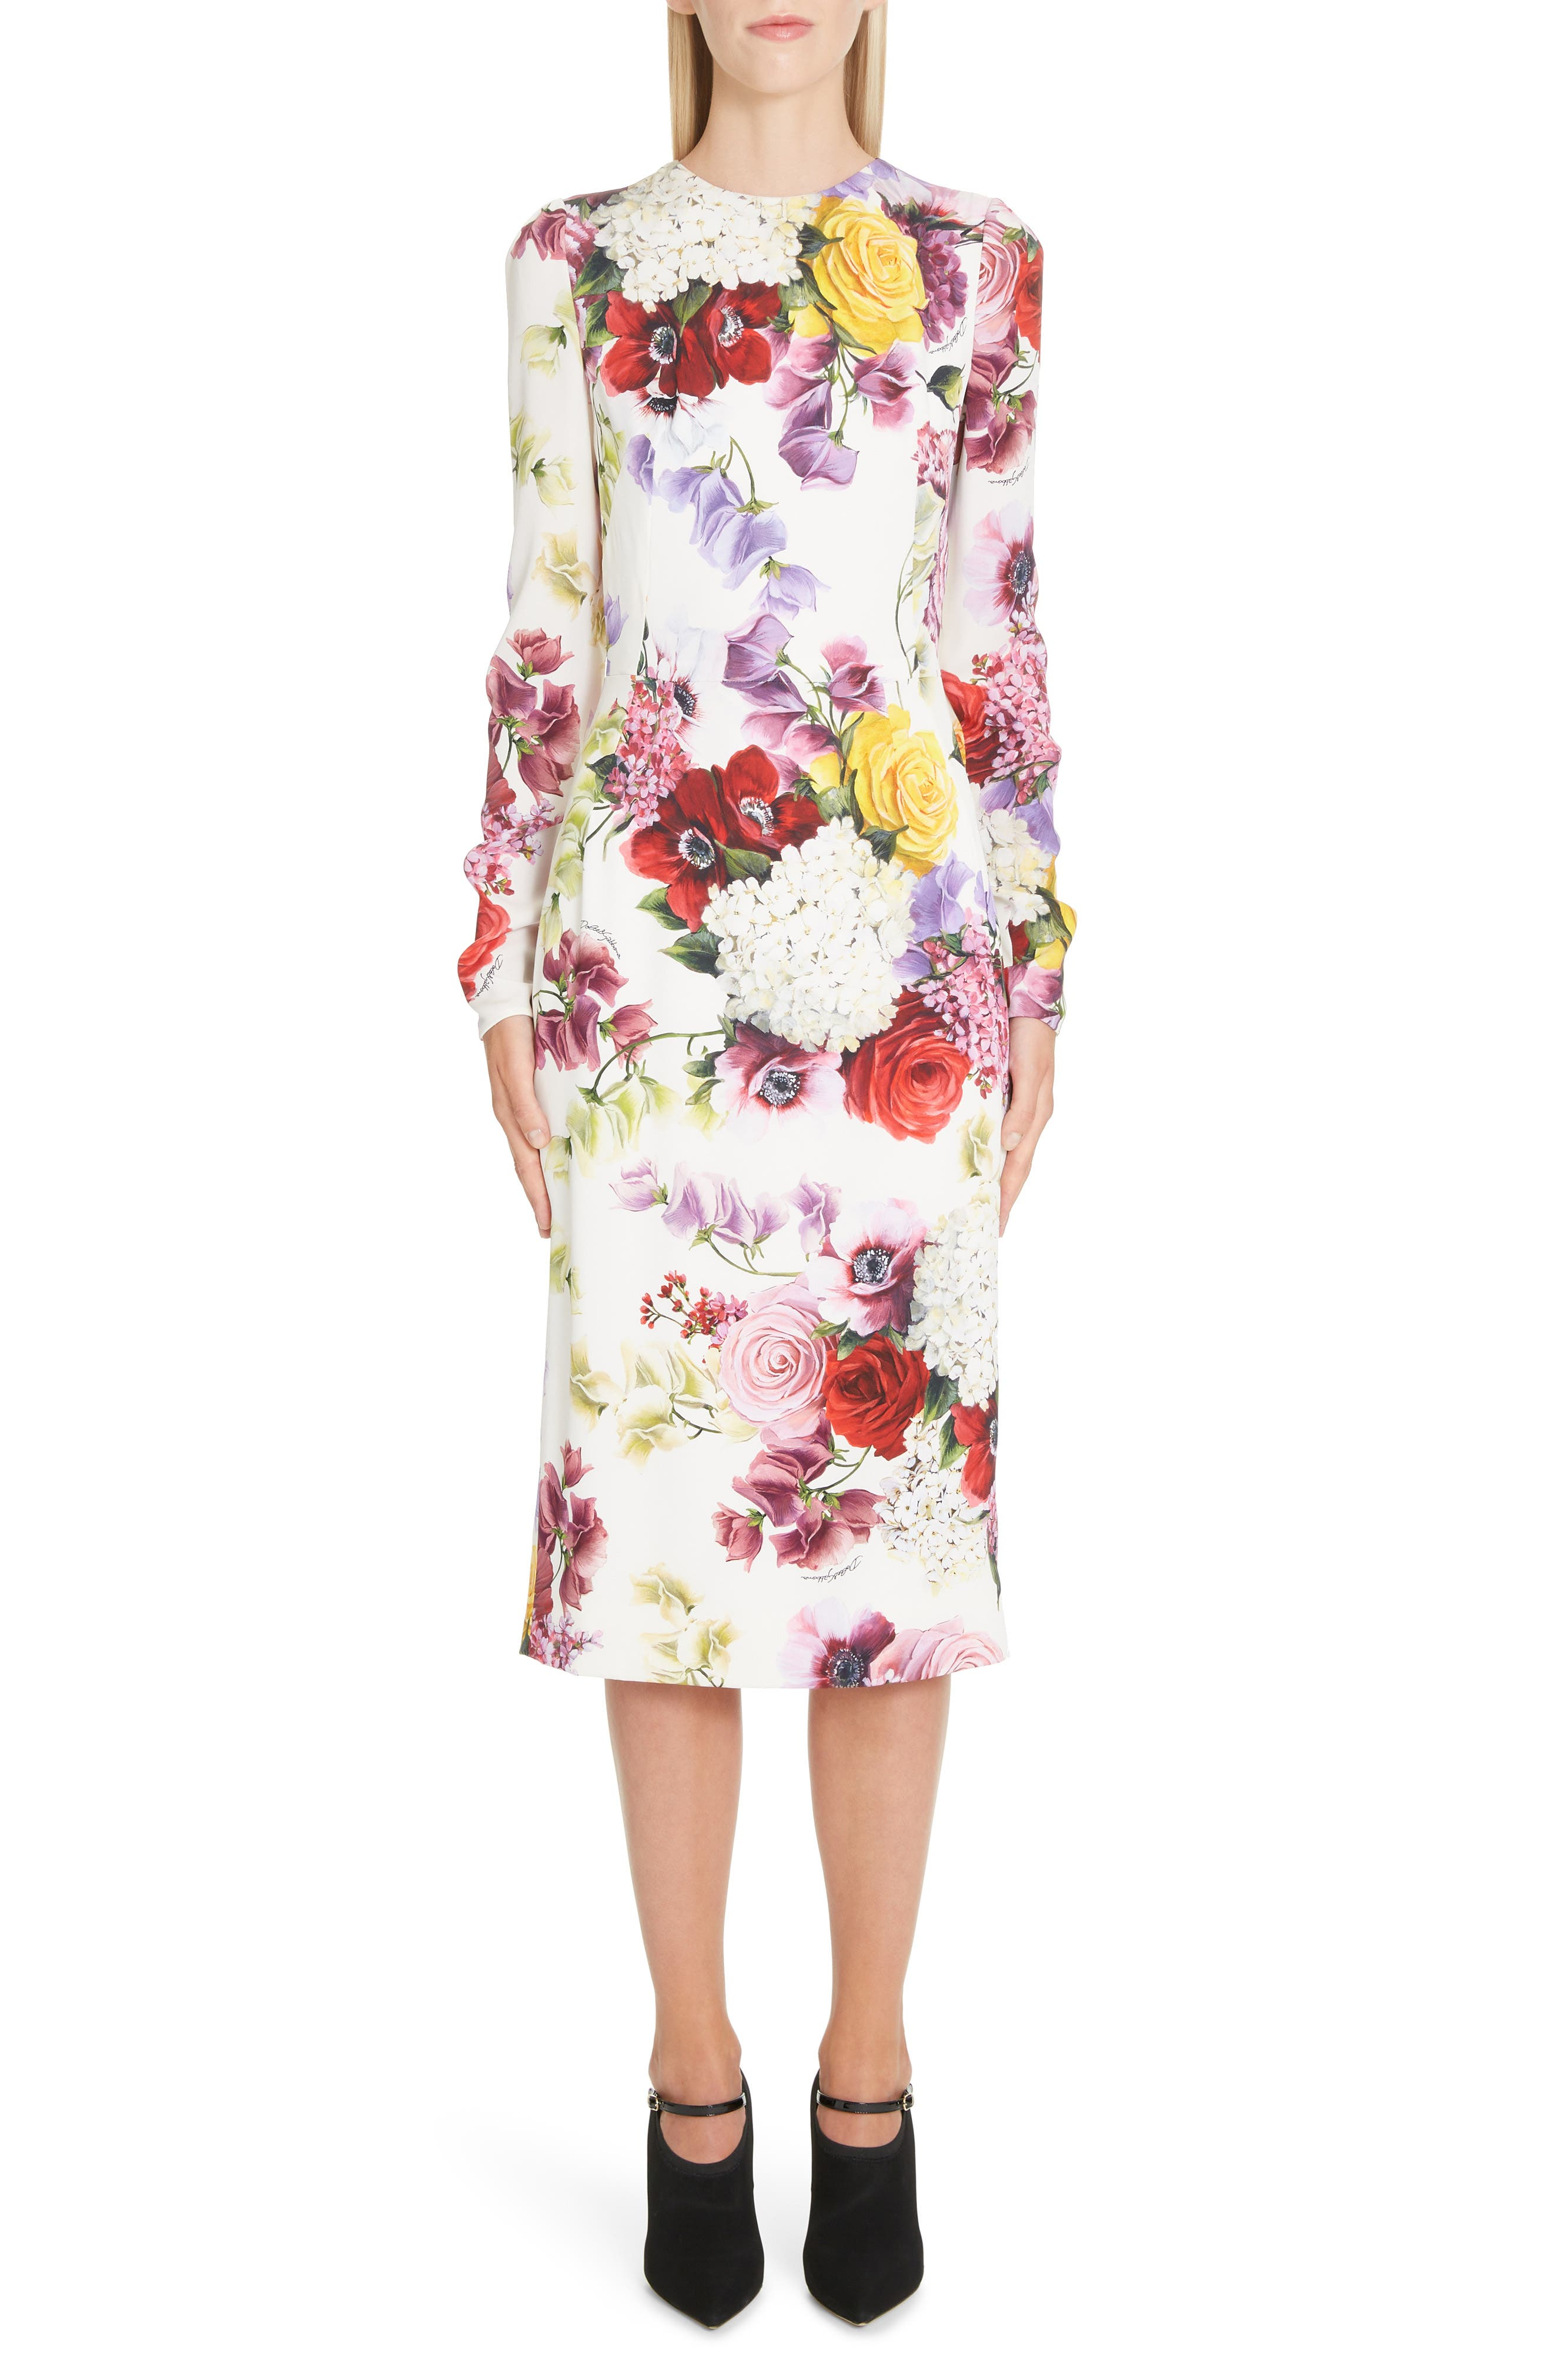 Dolce & gabbana Floral Print Stretch Silk Charmeuse Sheath Dress, US / 46 IT - White